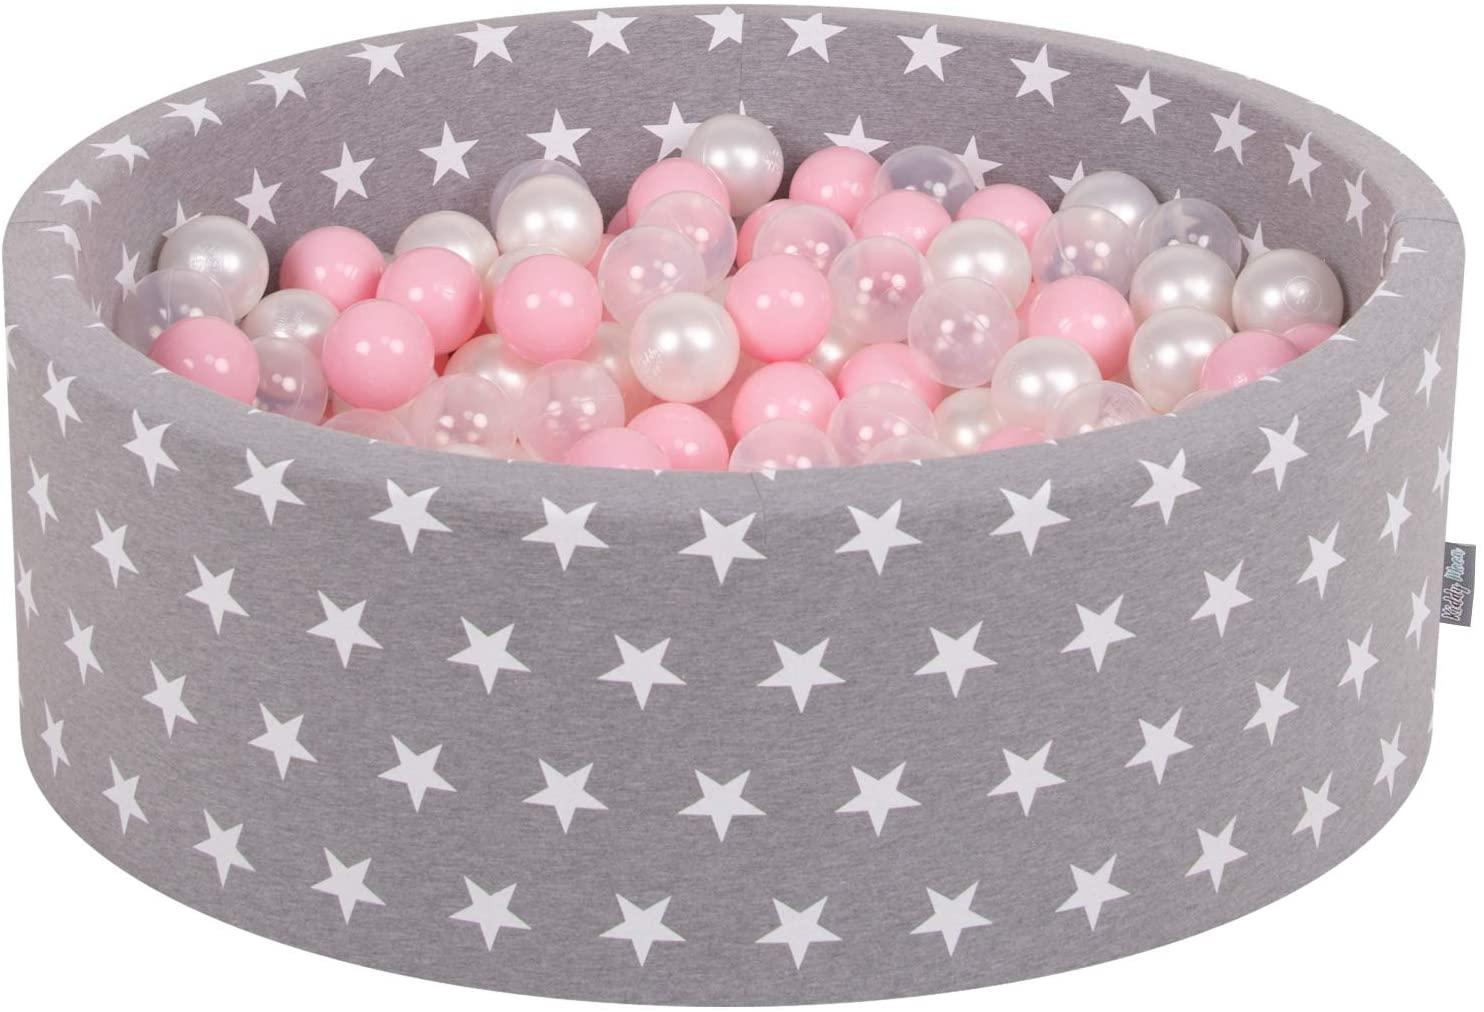 Piscina de bolas de estrellas para bebés